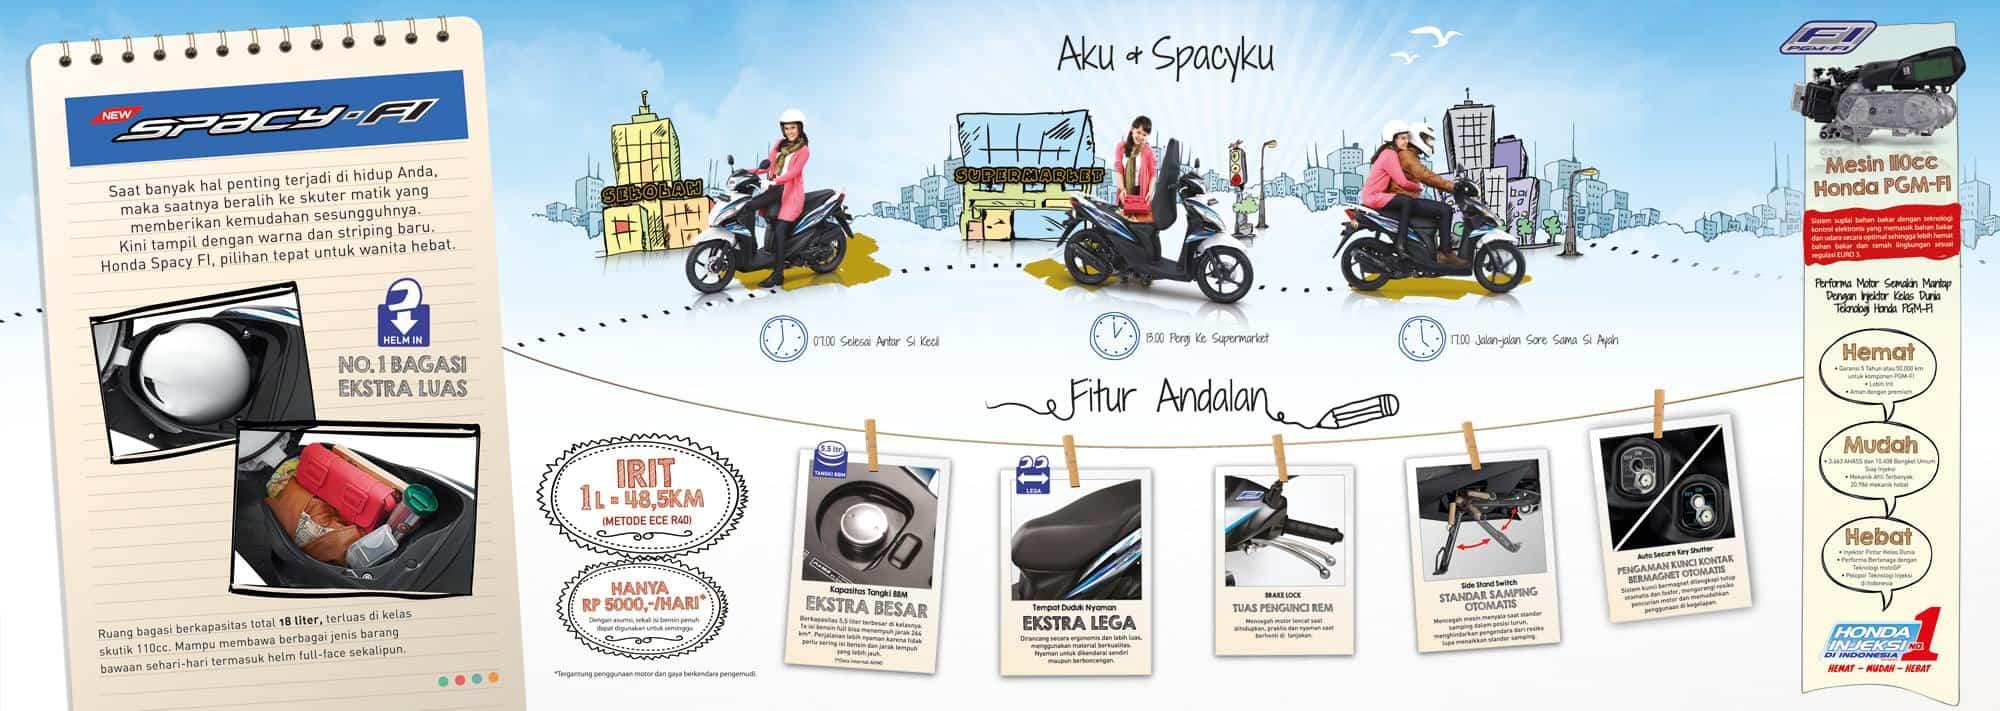 Brosur Motor Honda Spacy - 2